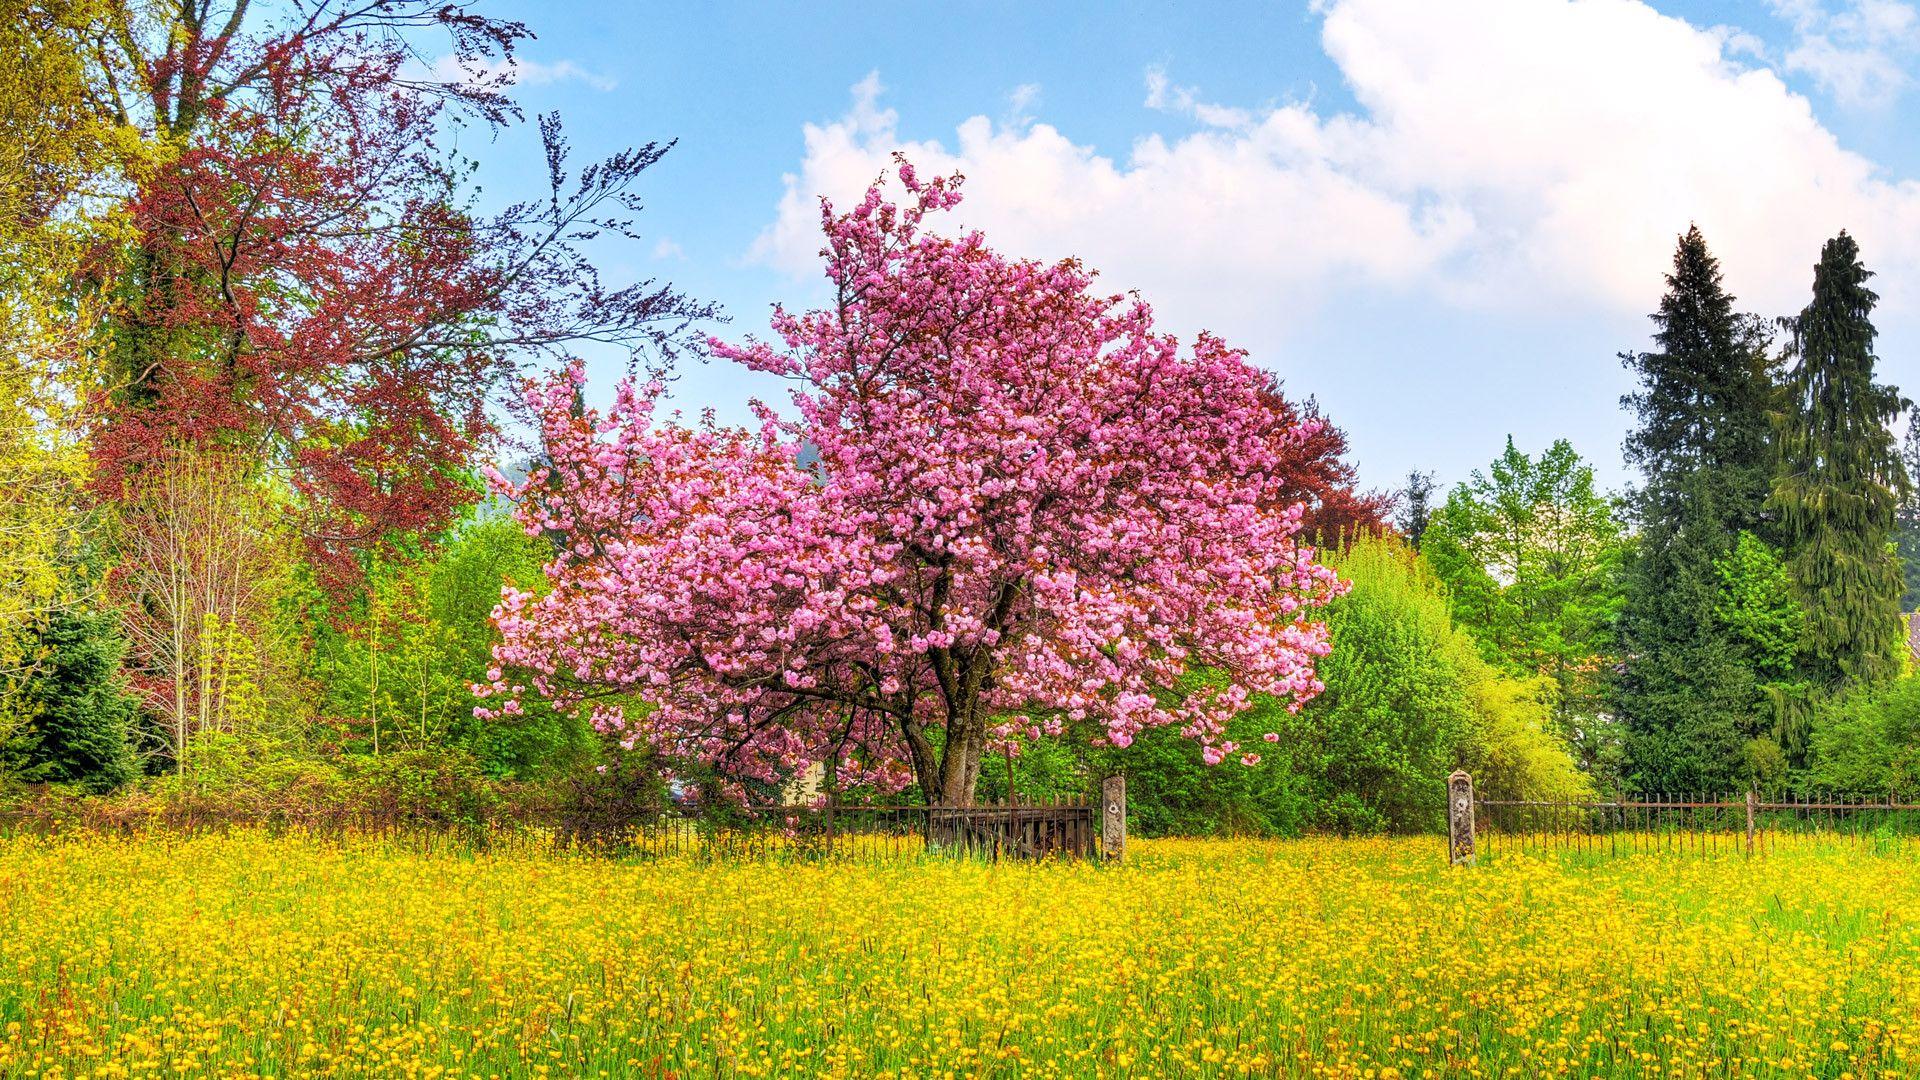 Hd Wallpapers 1080p Nature Spring Wallpaper Spring Landscape Spring Desktop Wallpaper